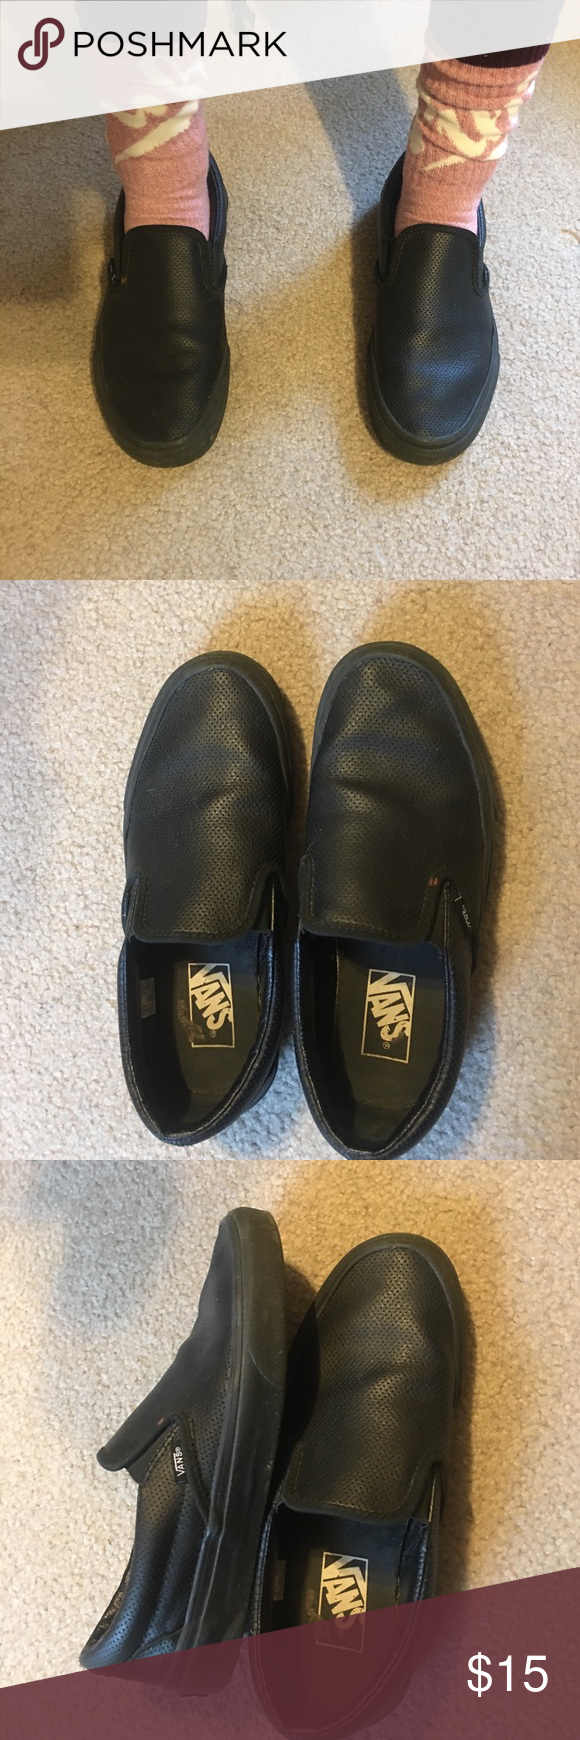 BLACK SIZE 6.5(male) 8(female) SLIP ON VANS barely worn Vans Shoes Flats & Loafers